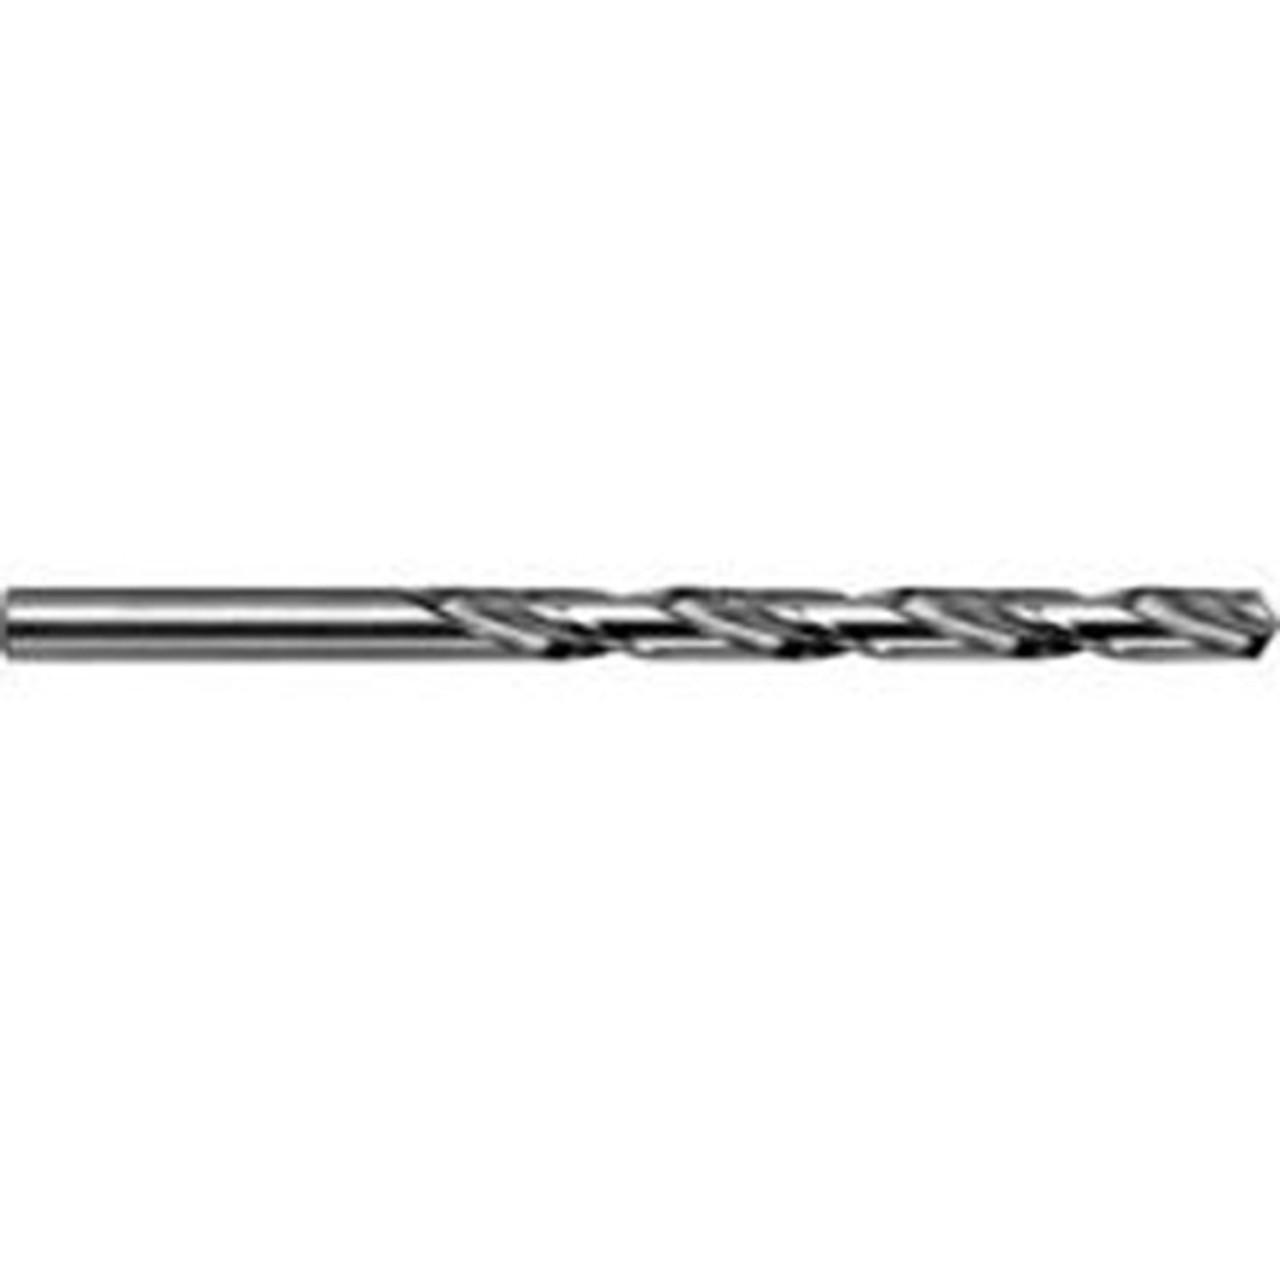 No Irwin Wire Gauge Drill Bit Hss 48 Carded